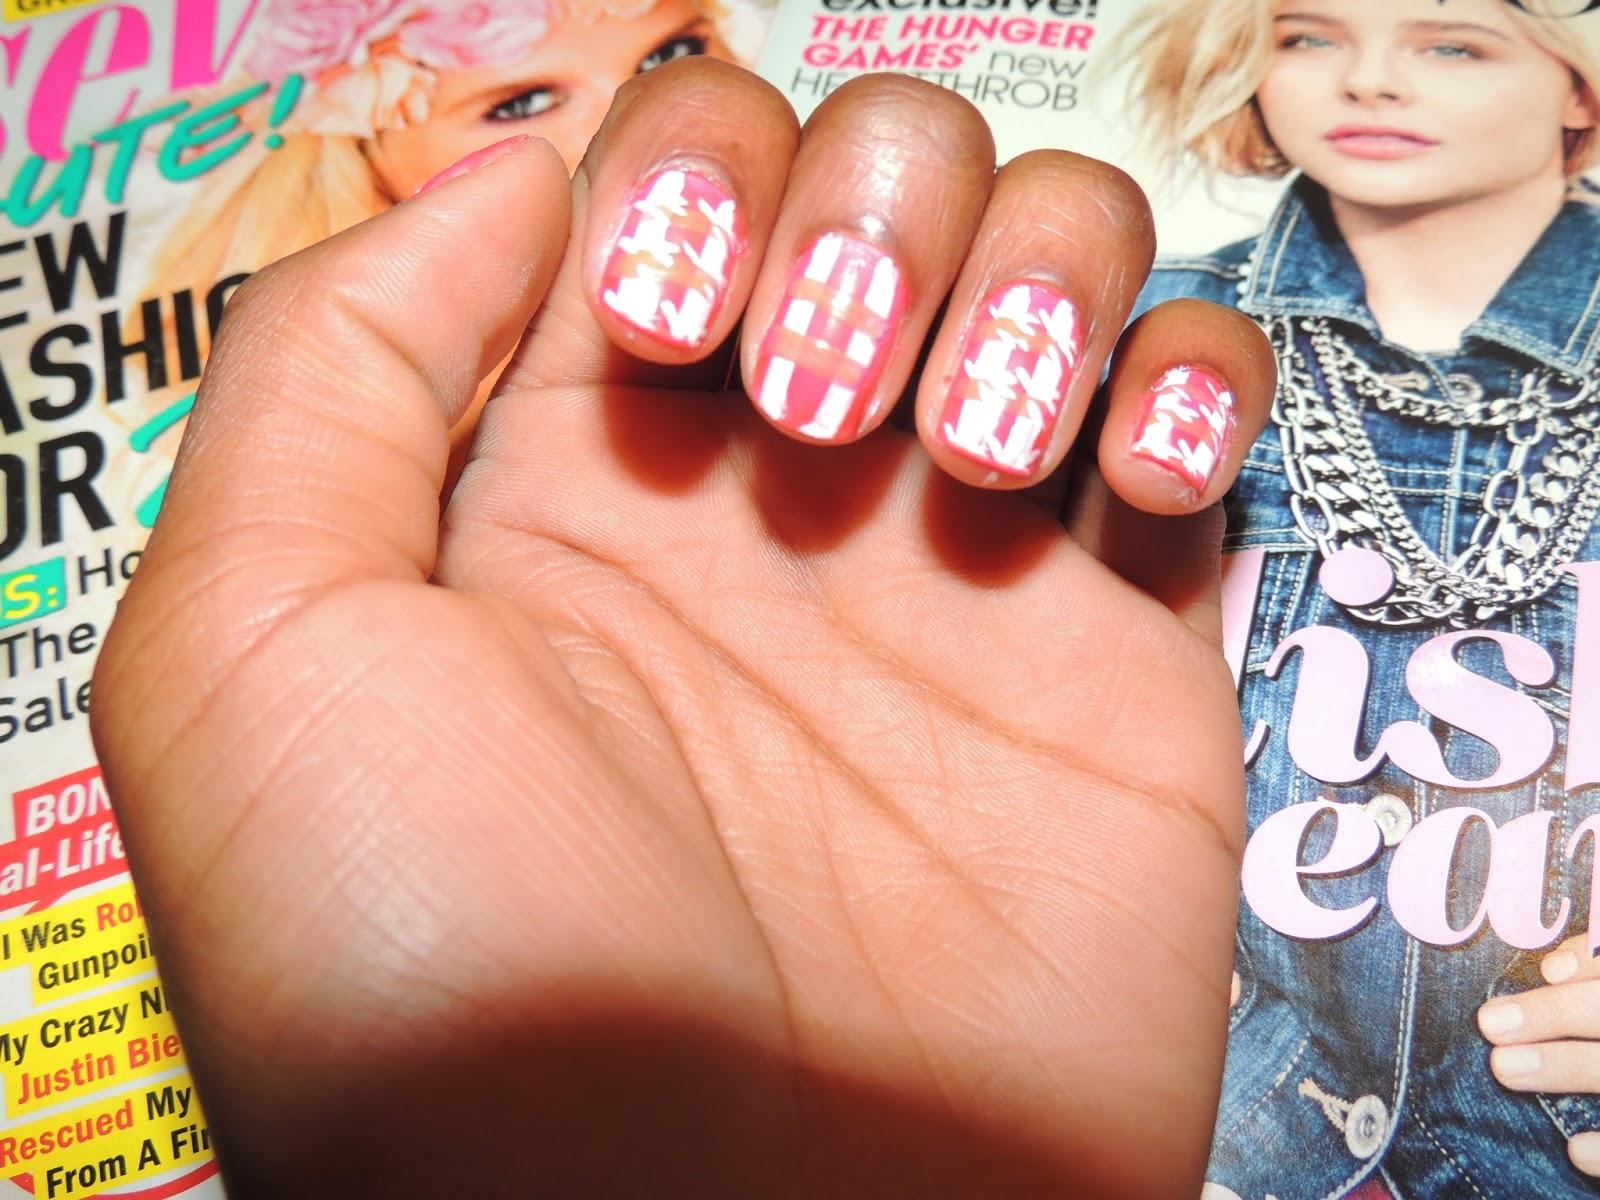 ... nail designs 2013 nicki minaj nail designs zendaya nail art stiletto